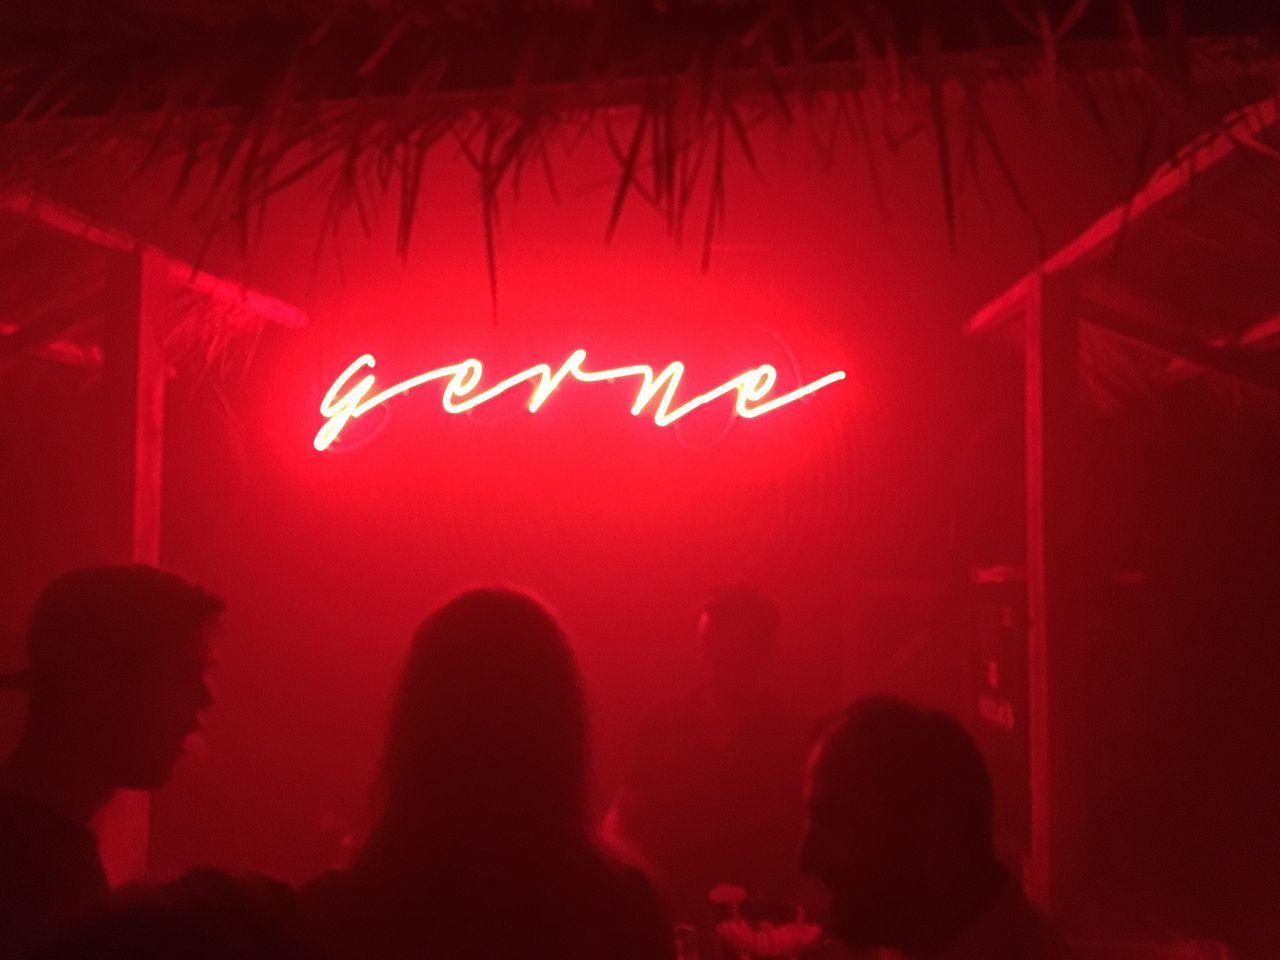 illuminated, communication, text, night, red, indoors, lighting equipment, nightlife, nightclub, neon, real people, close-up